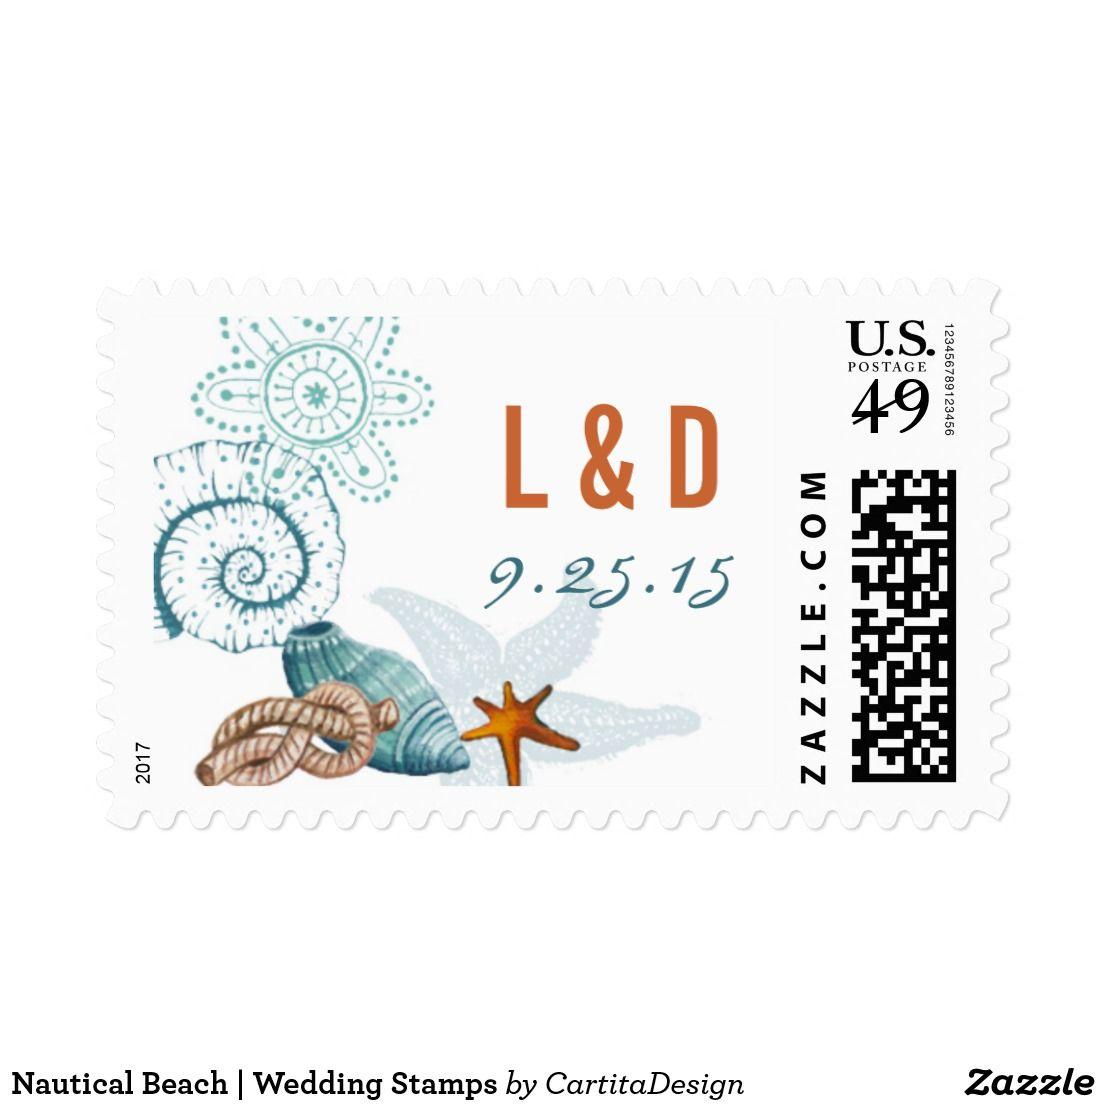 Nautical Beach Wedding Stamps